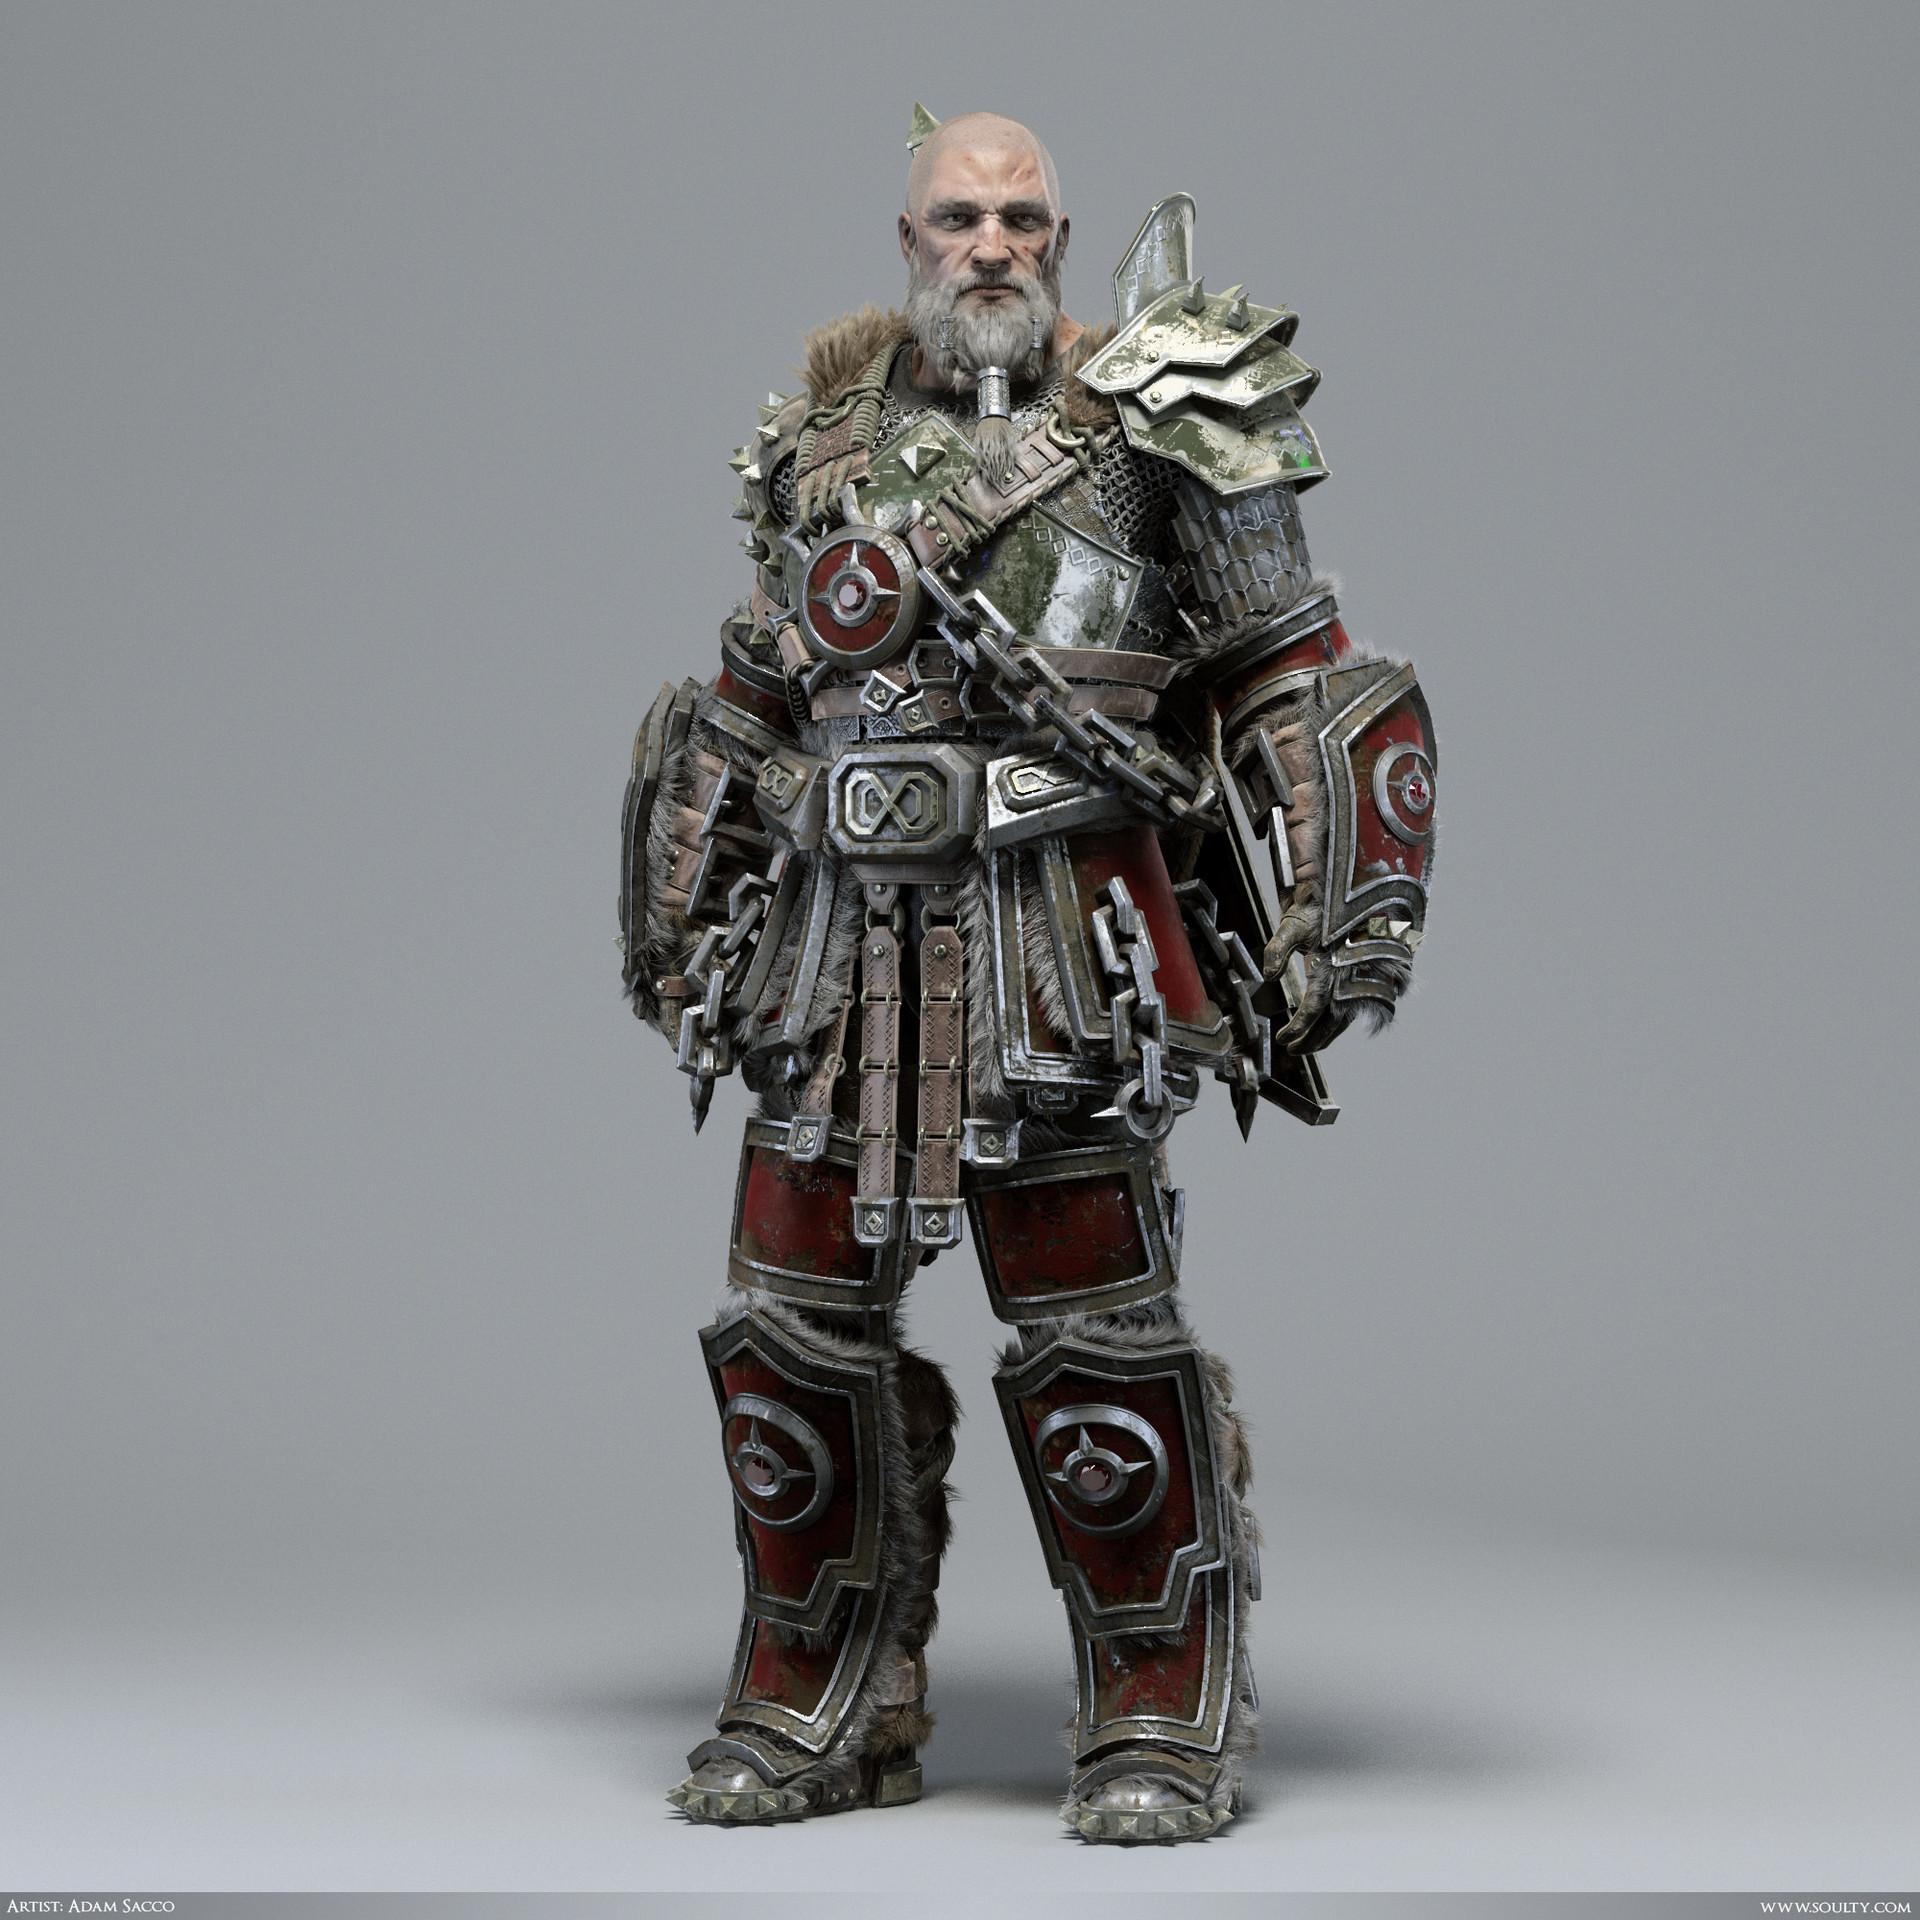 Adam sacco archaic warrior 1